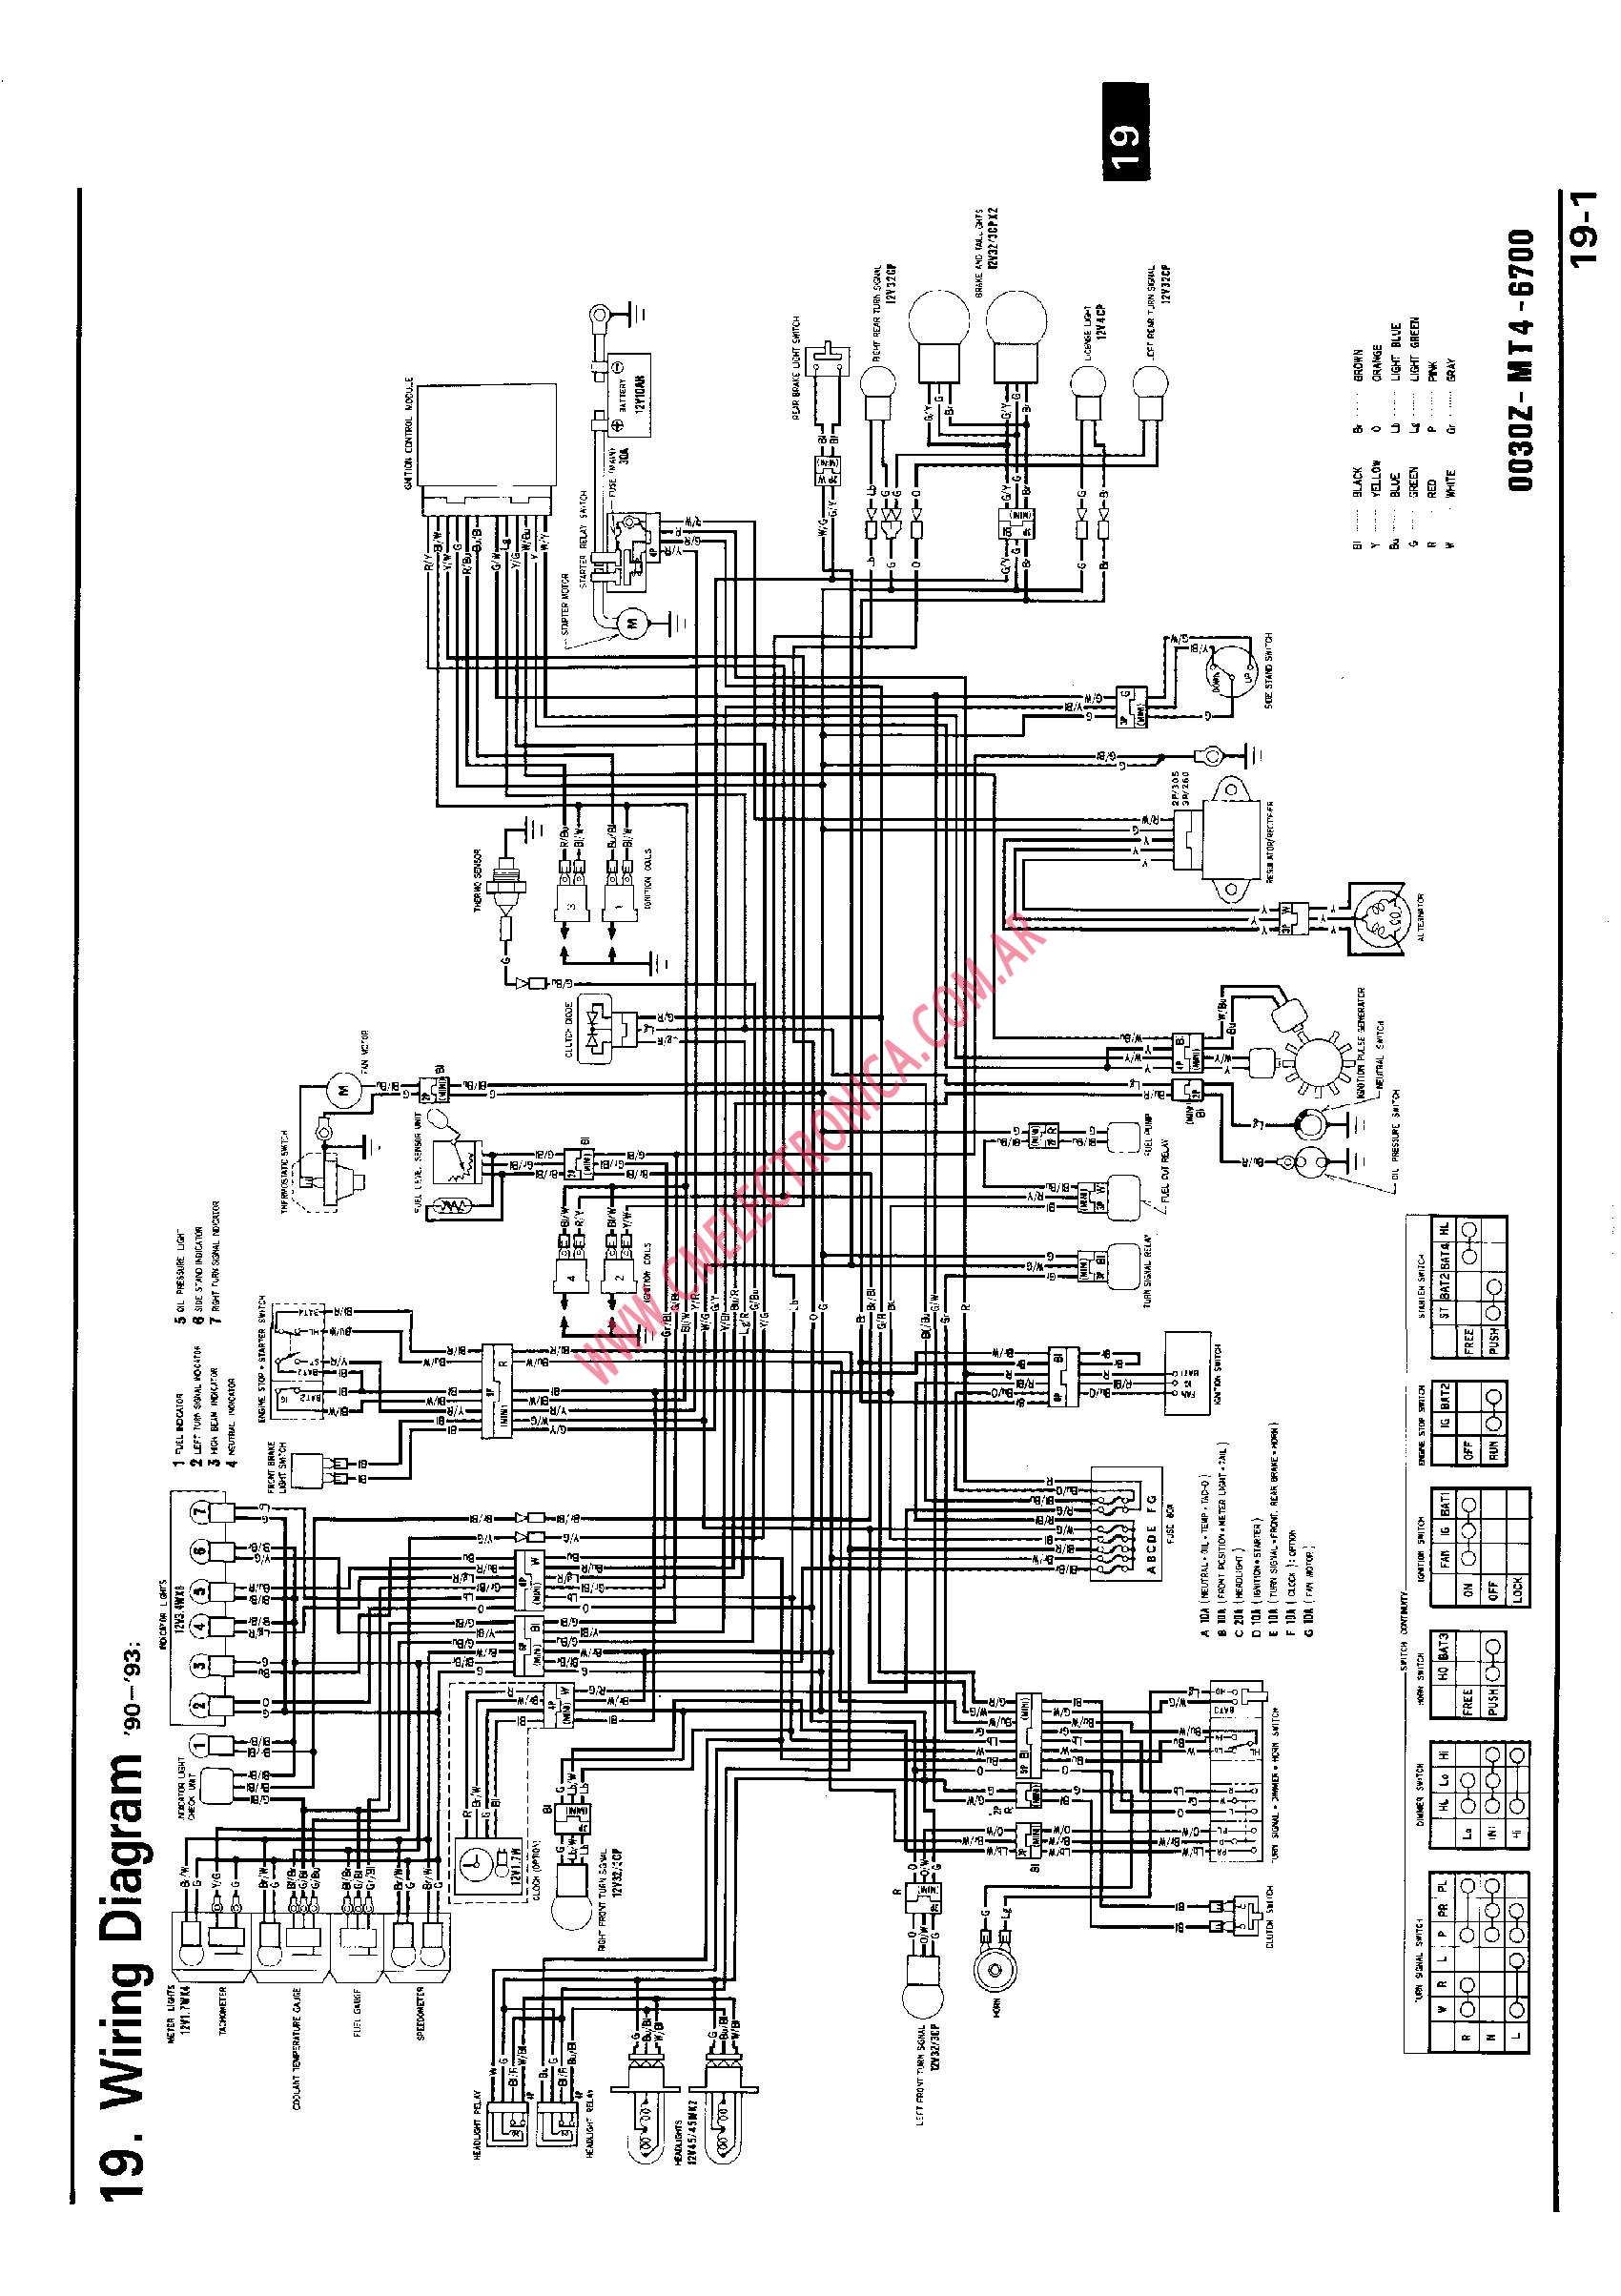 2002 kodiak 400 service manual